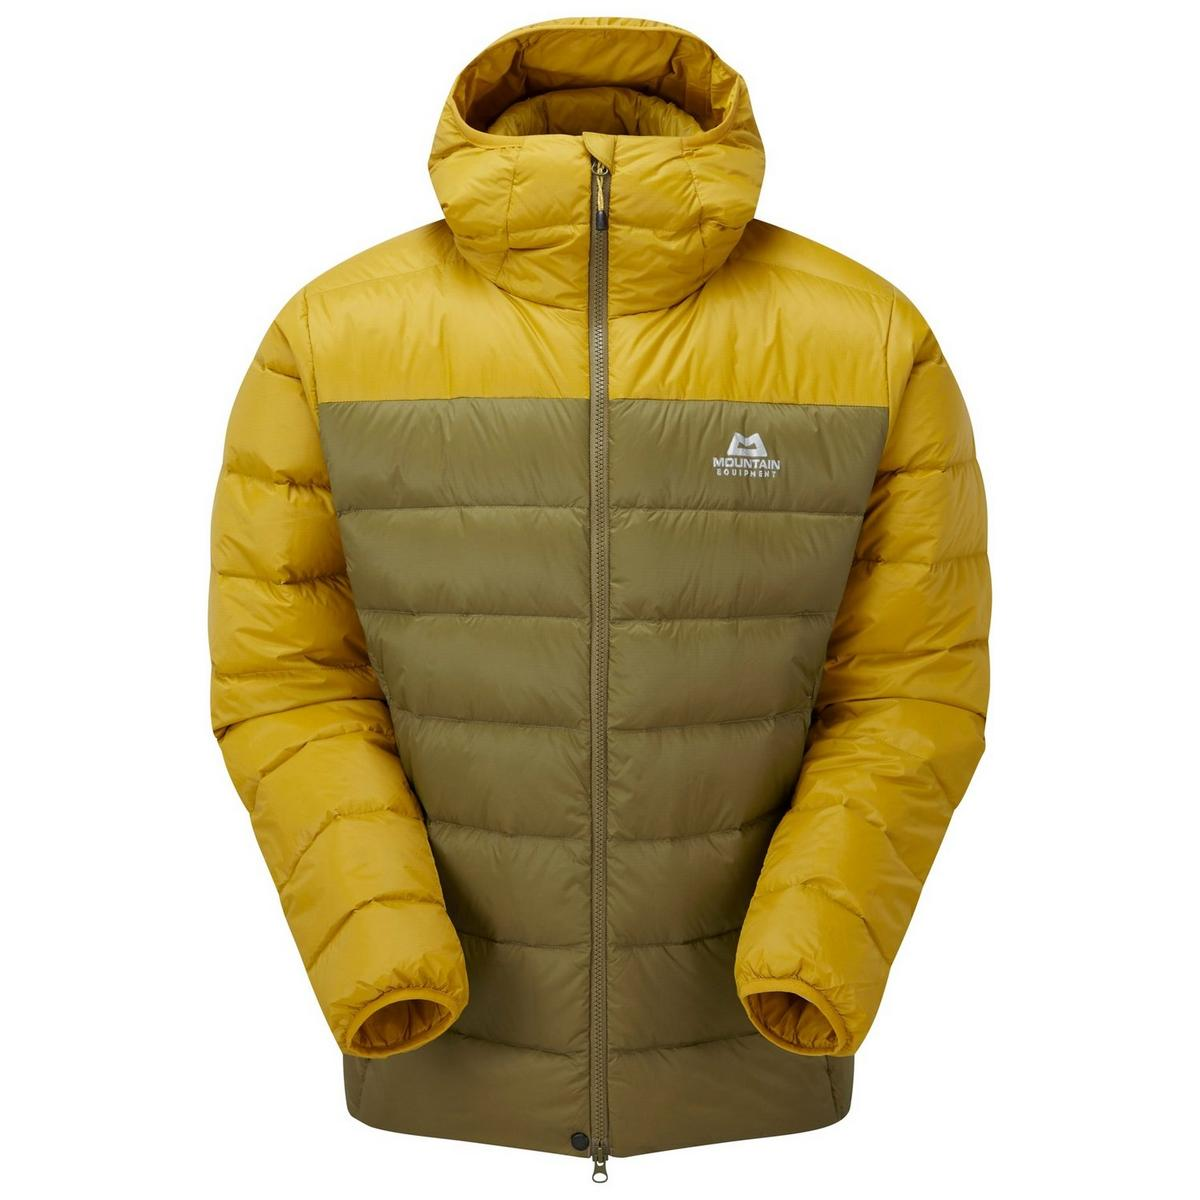 Mountain Equipment Men's Skyline Mountain Equipment Hooded Jacket - Yellow